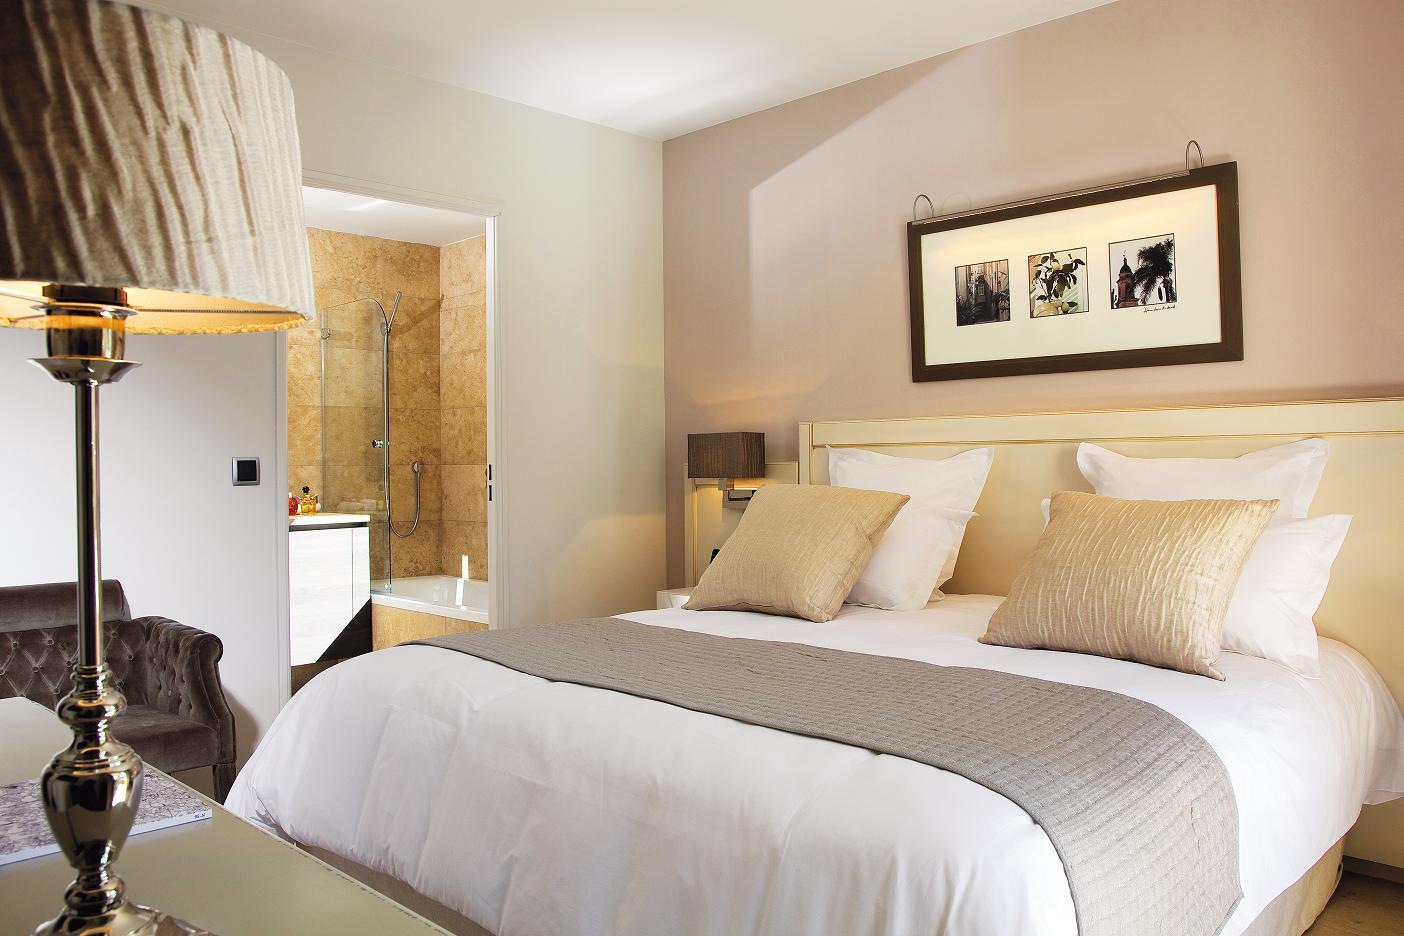 l 39 instant resto mas du grand vallon 06 250 mougins. Black Bedroom Furniture Sets. Home Design Ideas